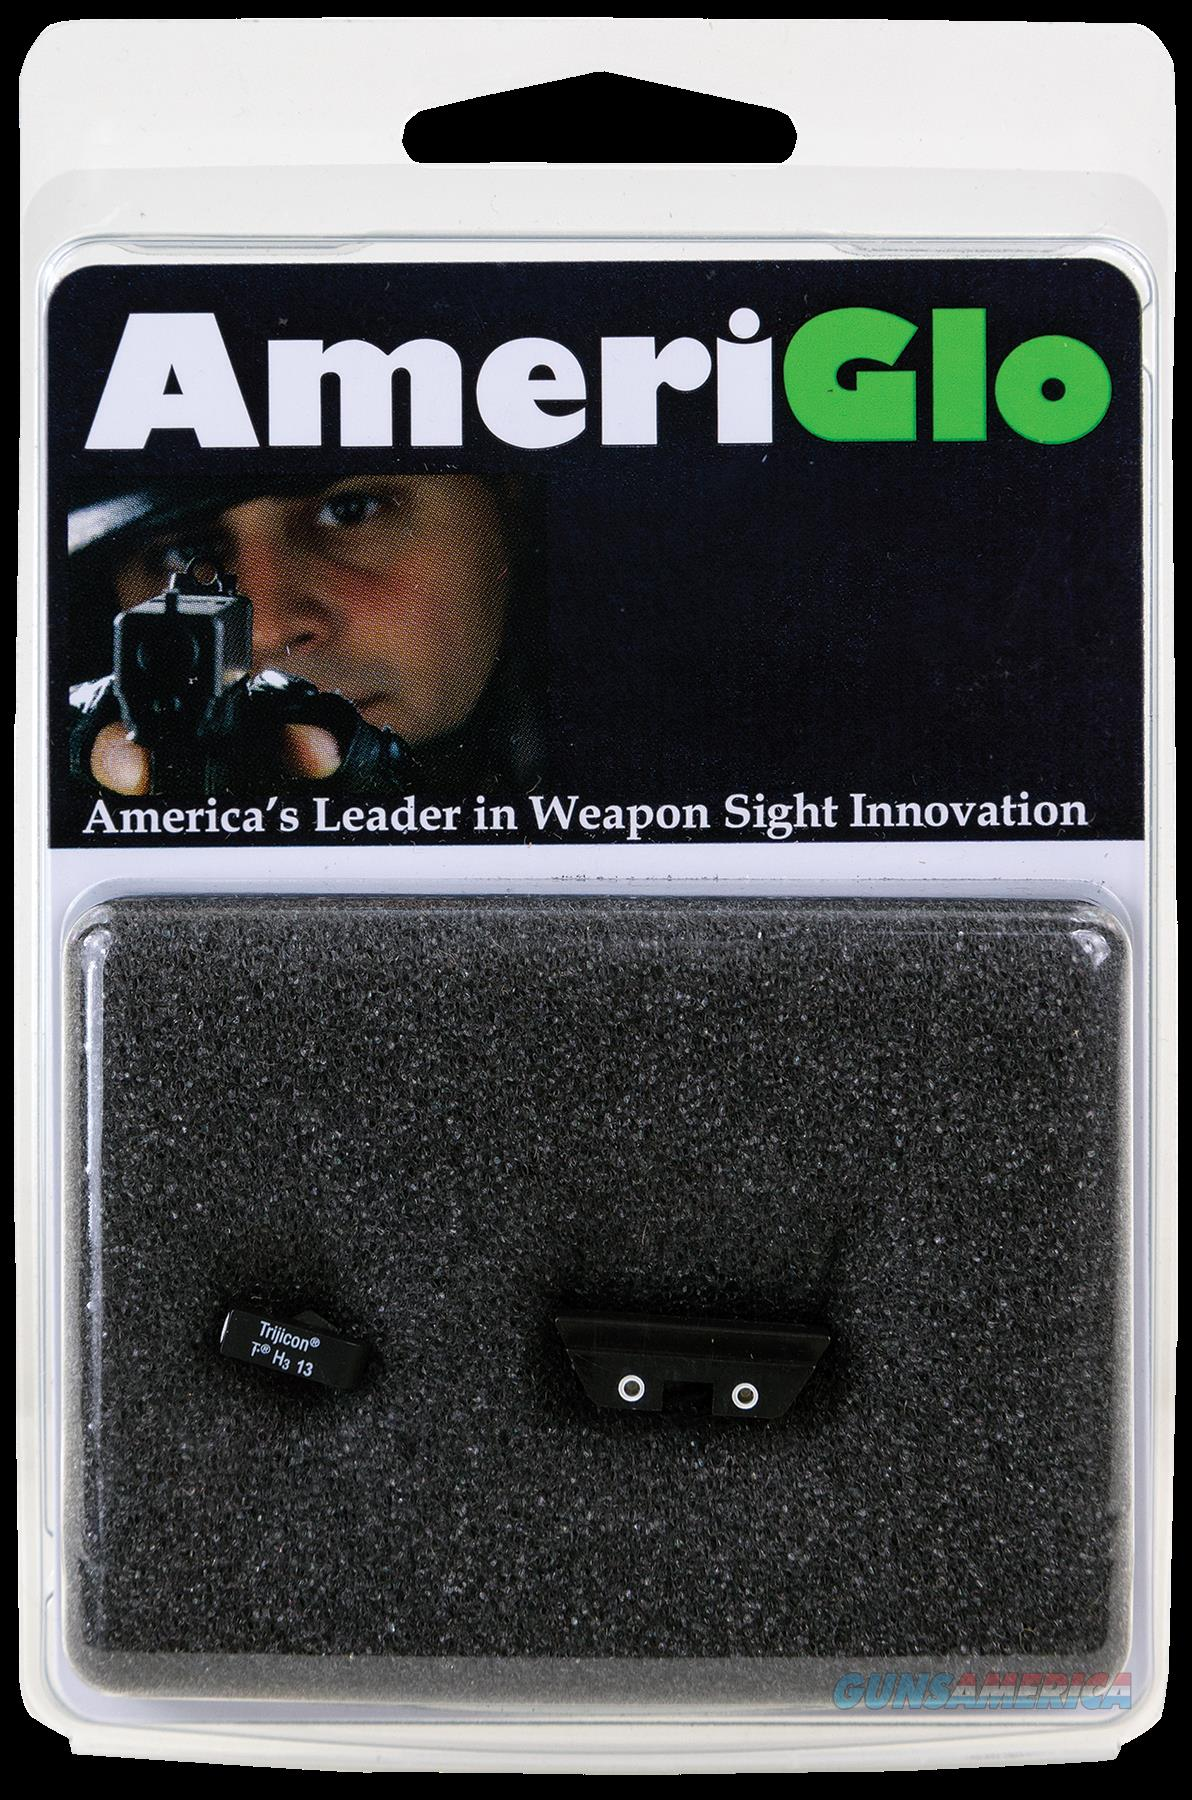 Ameriglo Classic 3 Dot, Amer Gl115 Night Sts Cls 9-40  Grn-ylw  Guns > Pistols > 1911 Pistol Copies (non-Colt)